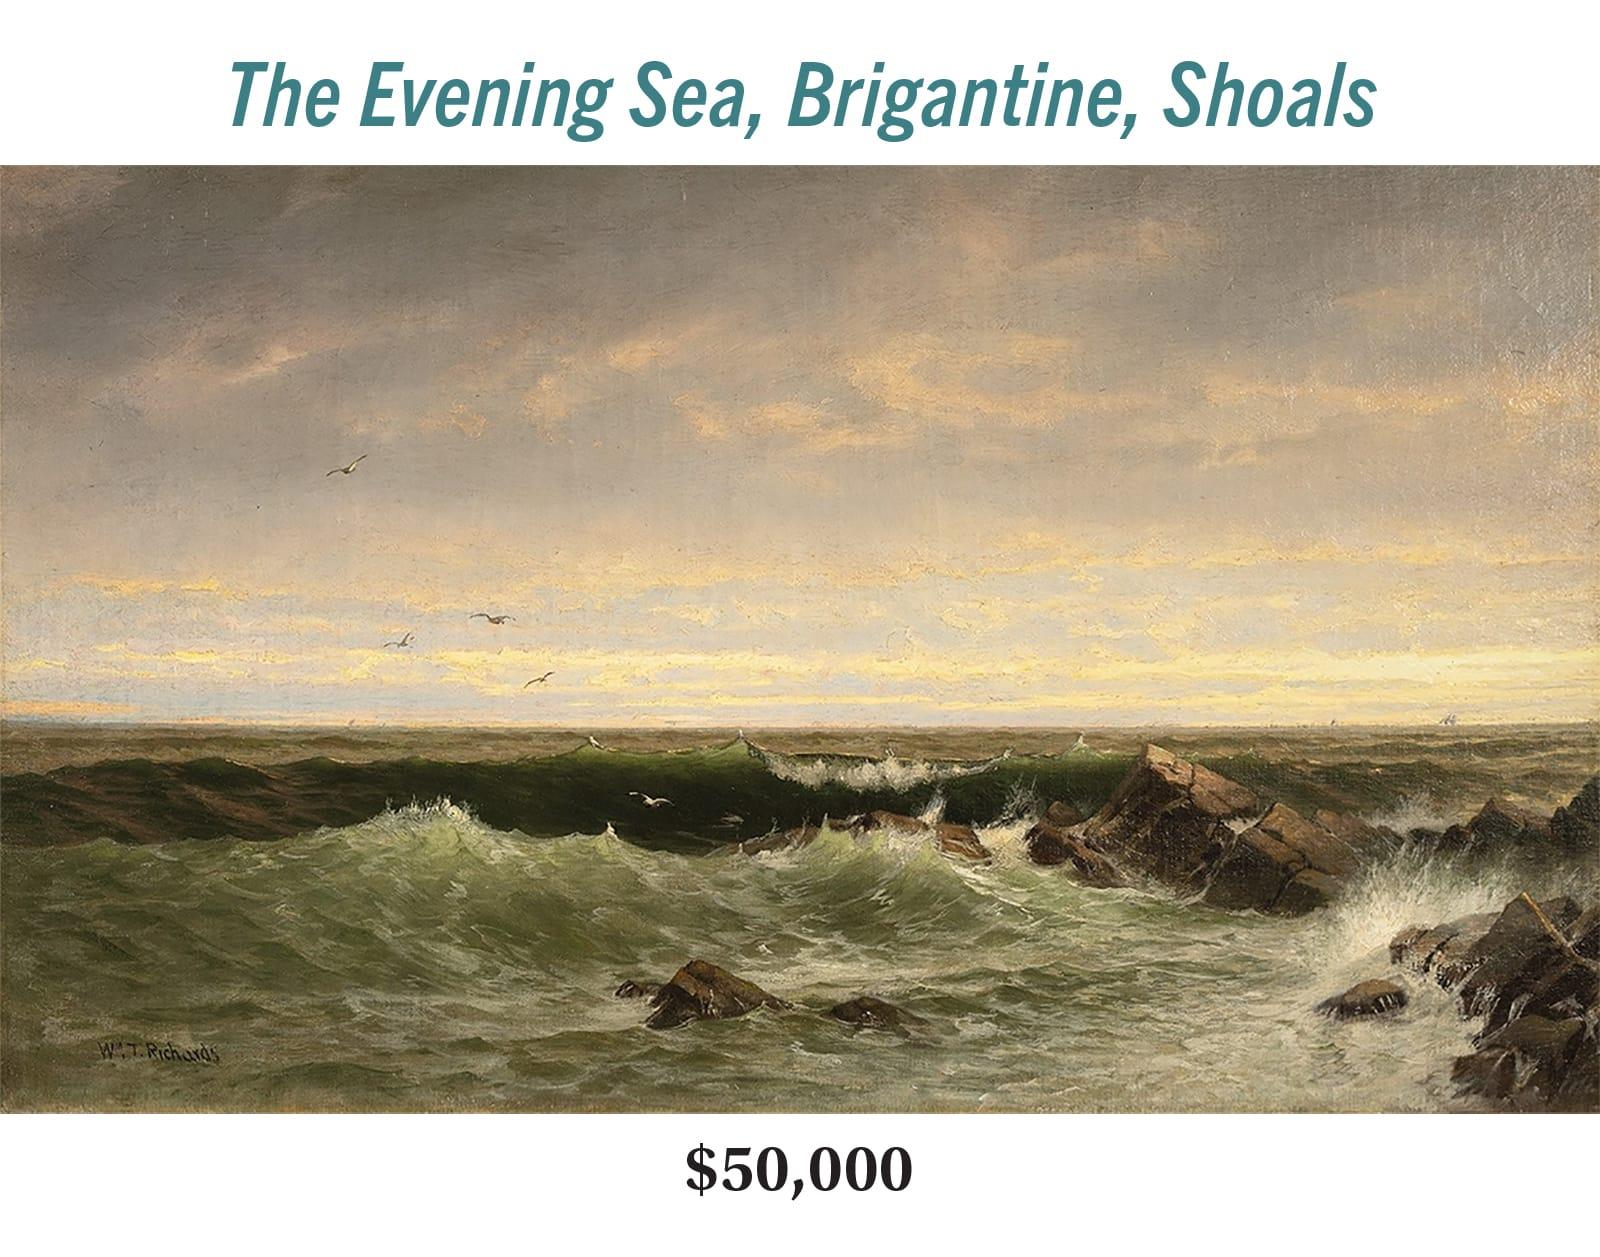 William Trost Richards (1833–1905), The Evening Sea, Brigantine, Shoals, oil on canvas, Hudson River School seascape painting